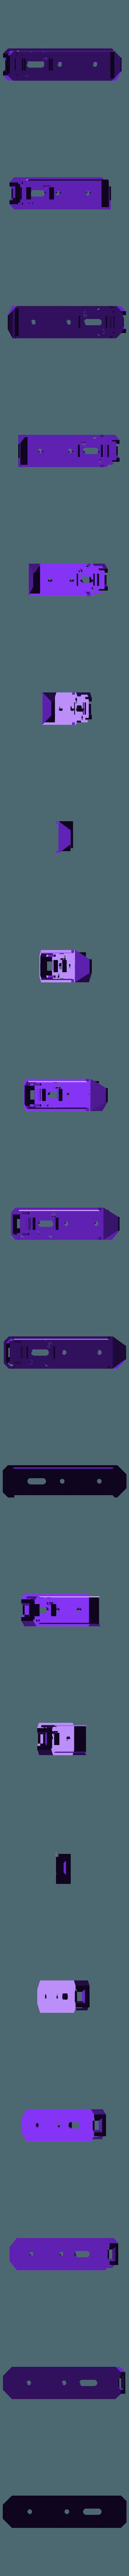 rezz-bat-box.stl Download free STL file Rezz-Inspired NeoPixel Glasses • 3D printing template, Adafruit